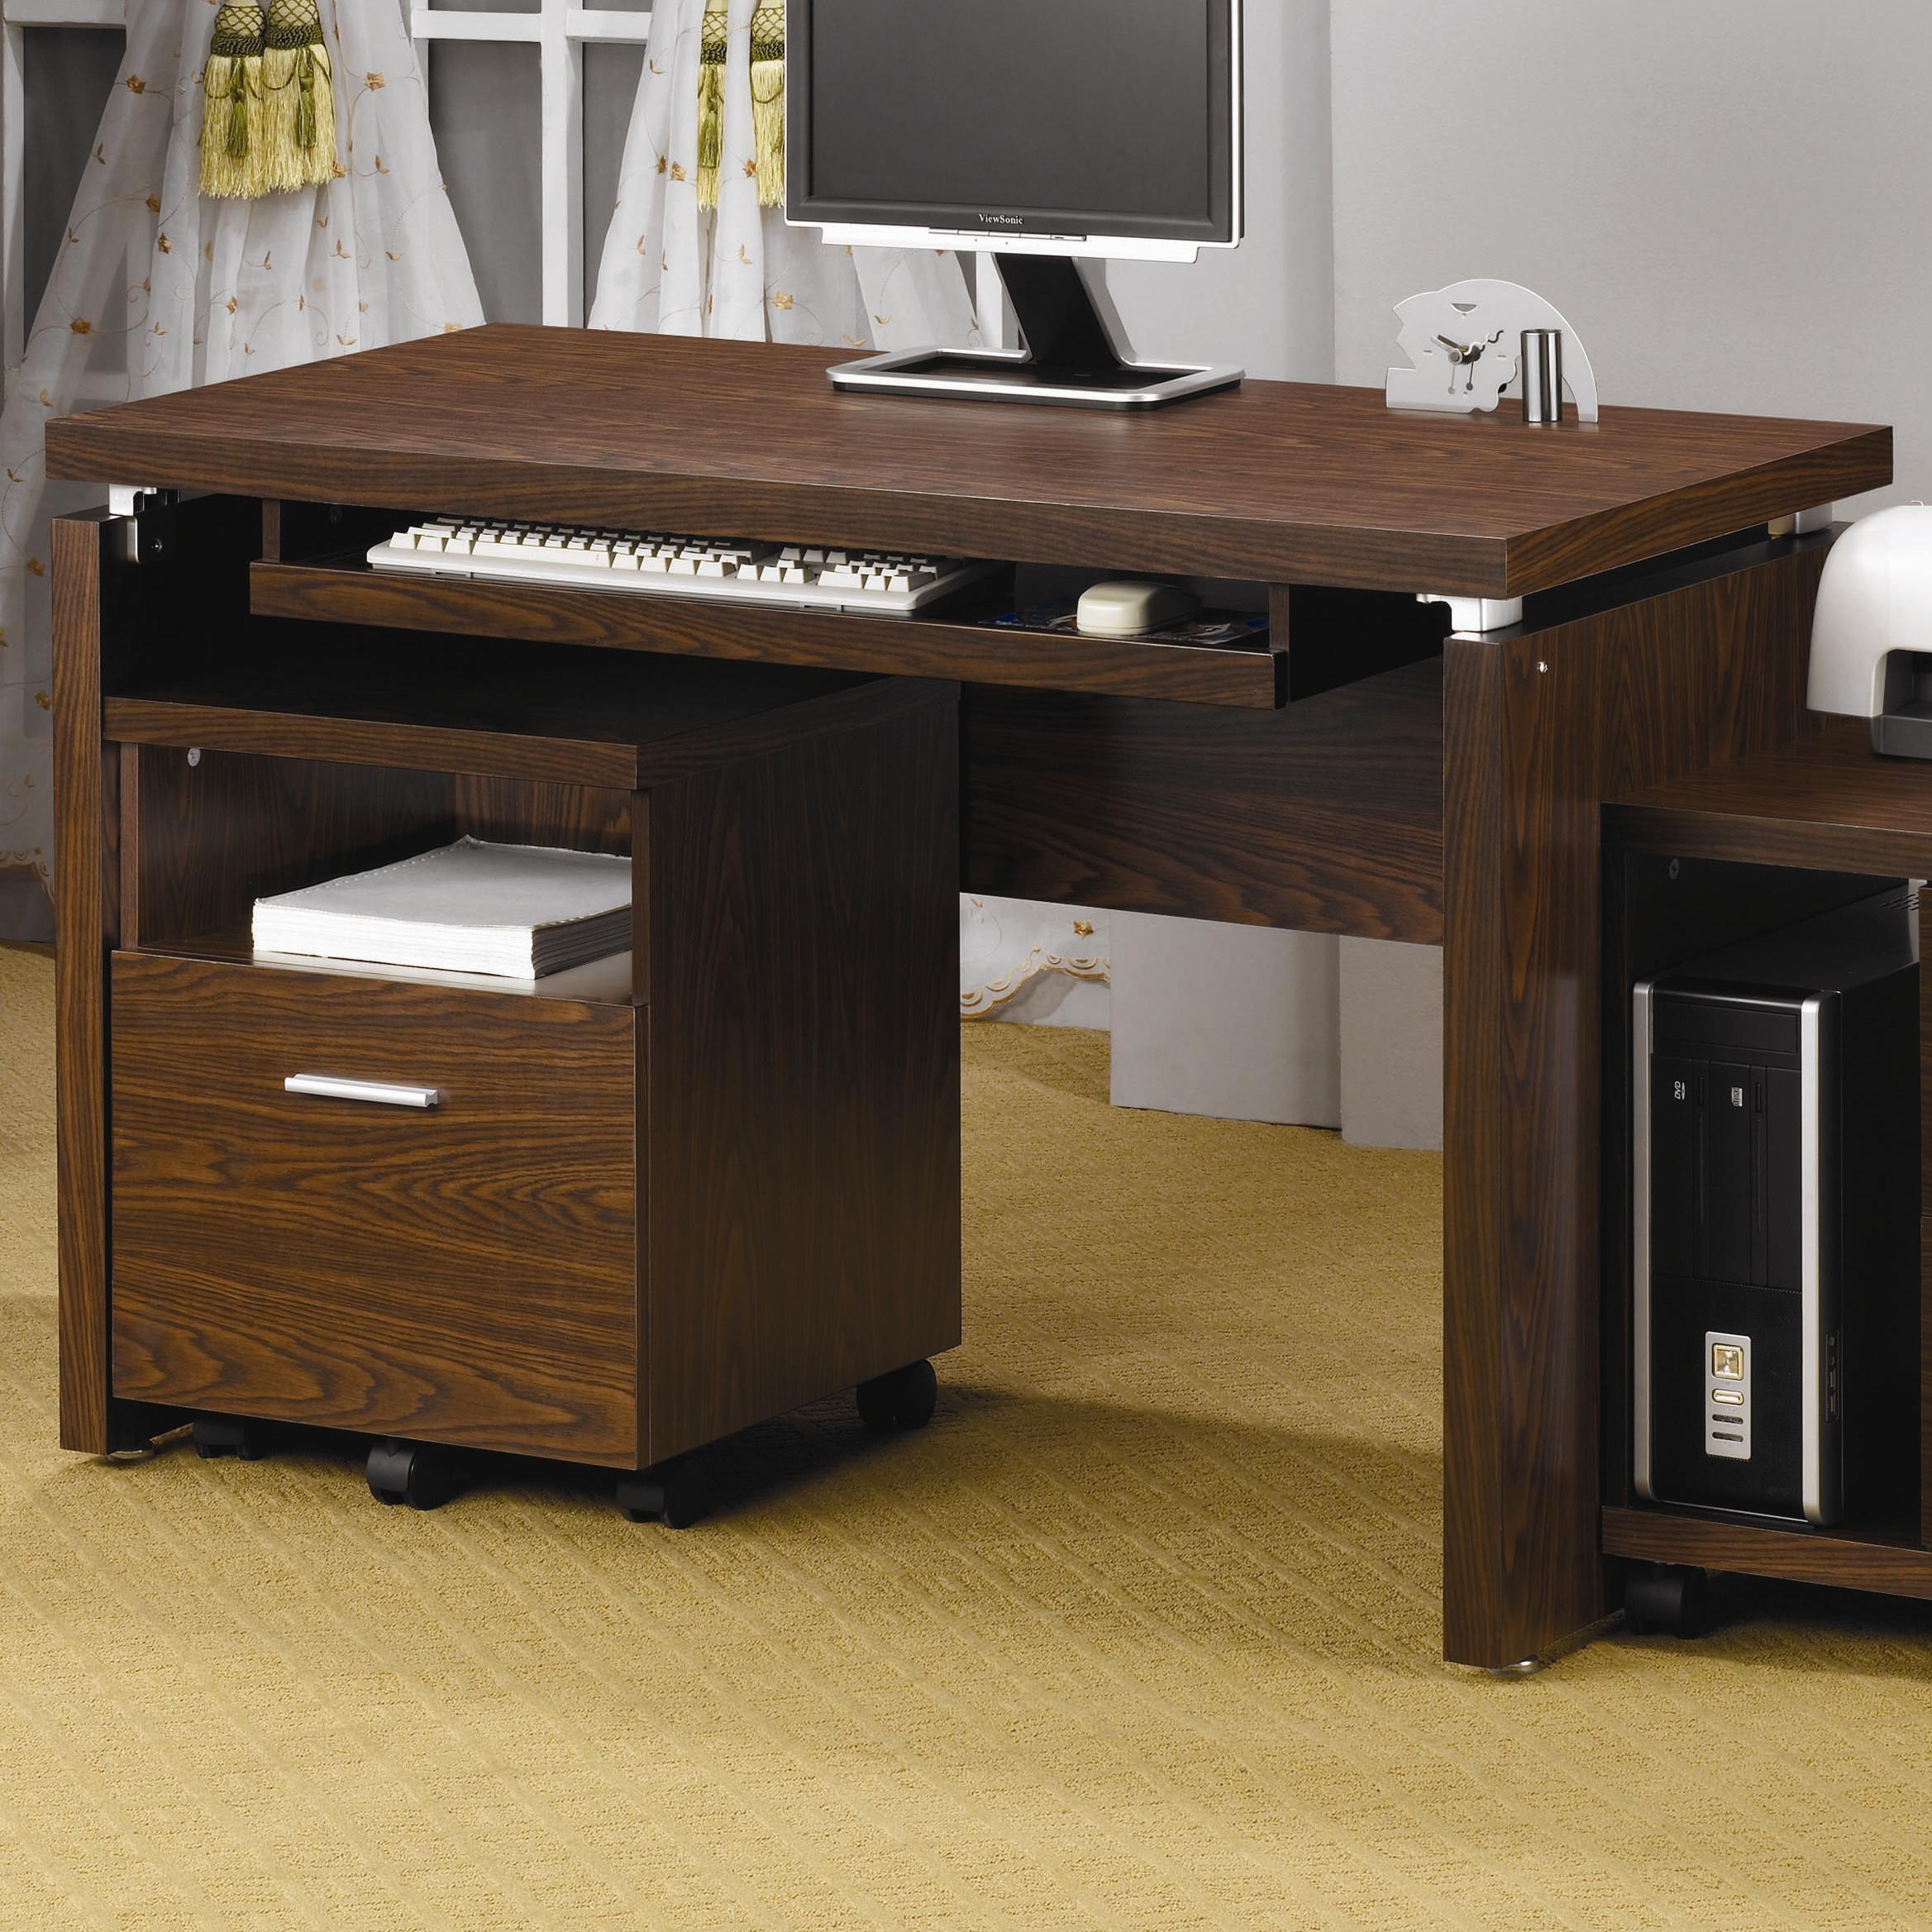 800831. Computer Desk